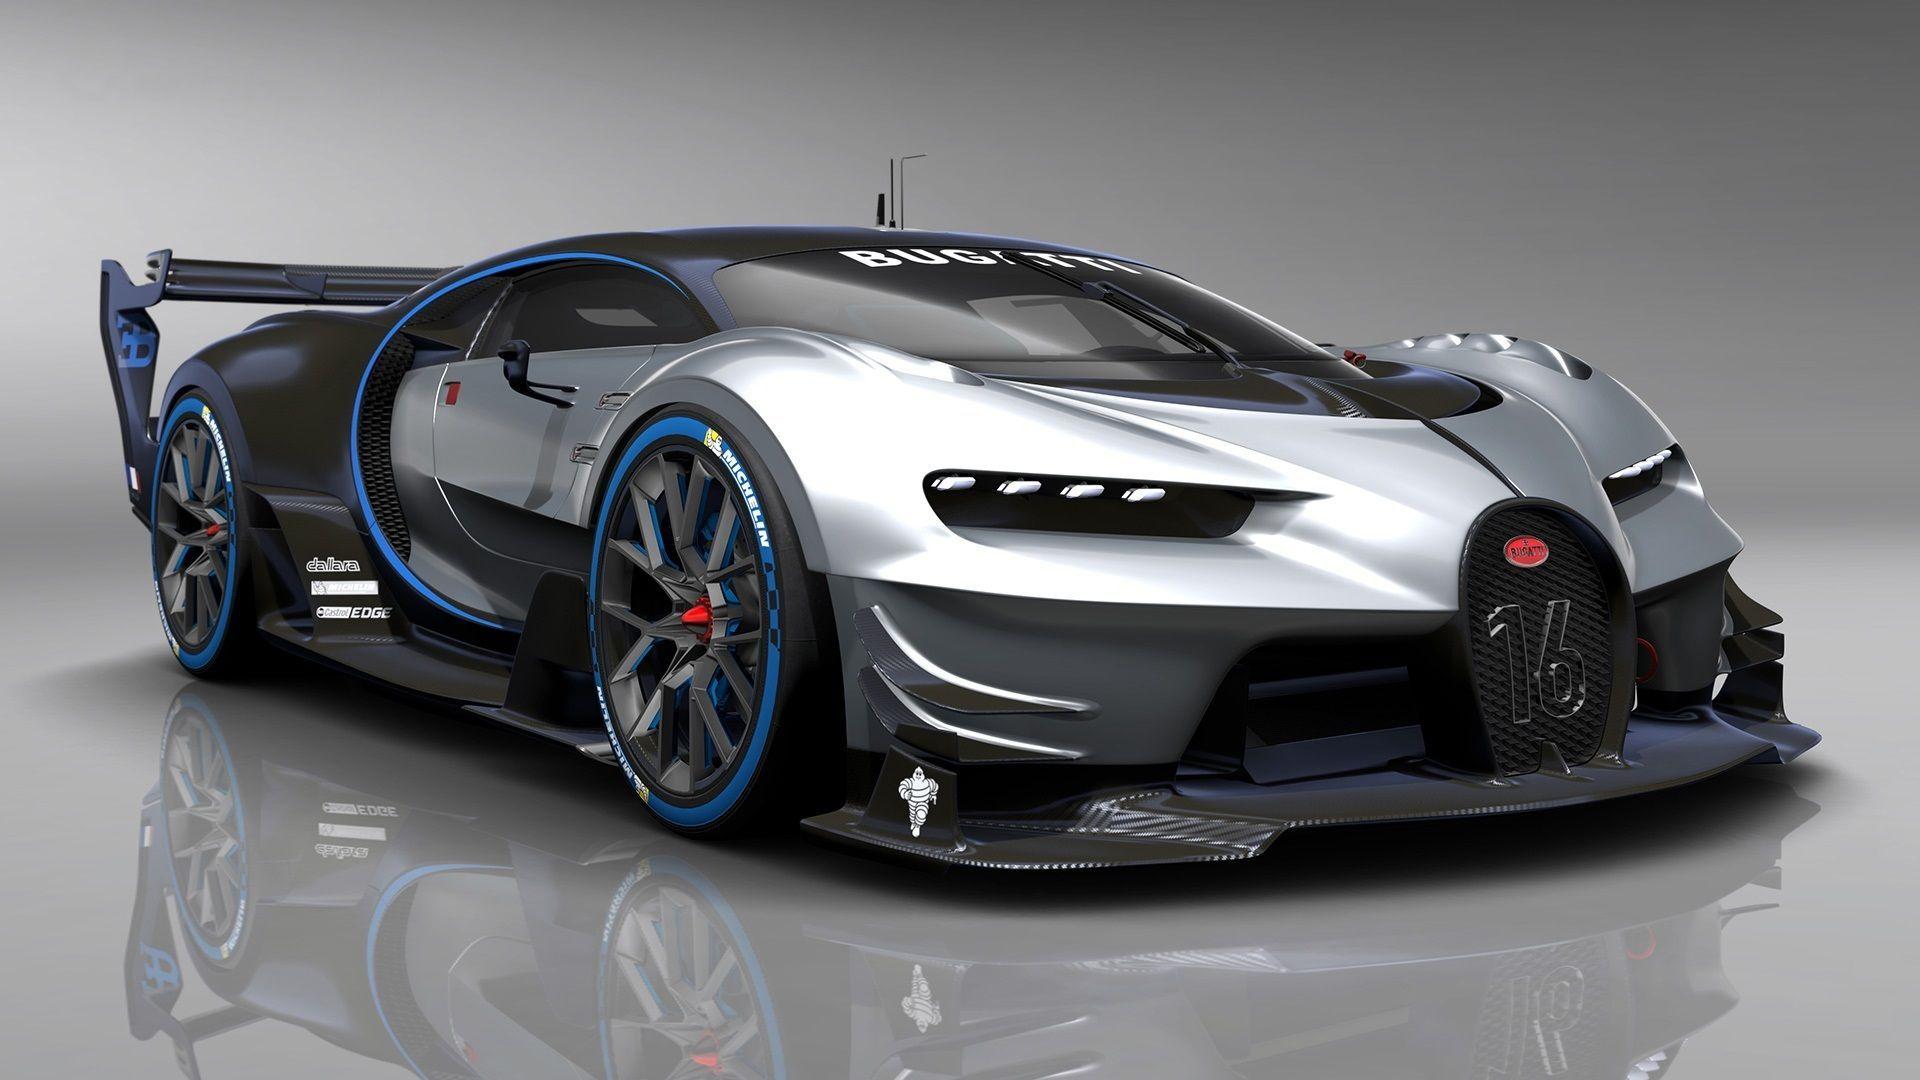 Bugatti Vision Sundulpoker Pkstars88 Sundulpkr Sundulpoker88 Idsundulpoker Sundulterus Indosundul Sundulpk Sundulga Bugatti Mobil Eksotis Mobil Balap